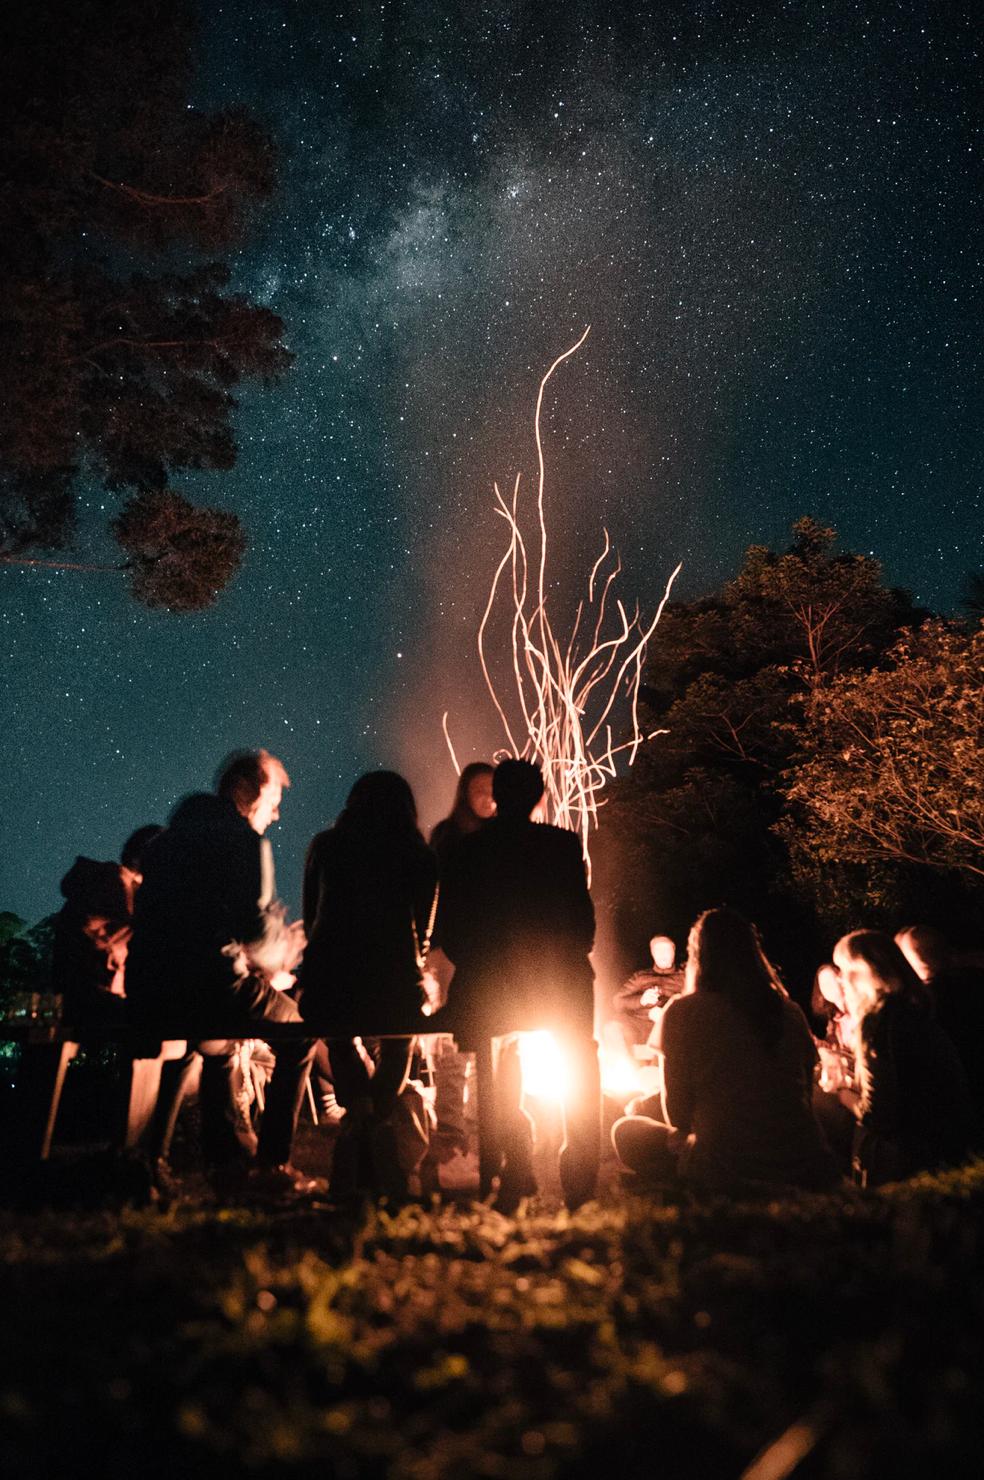 innovate around the fire